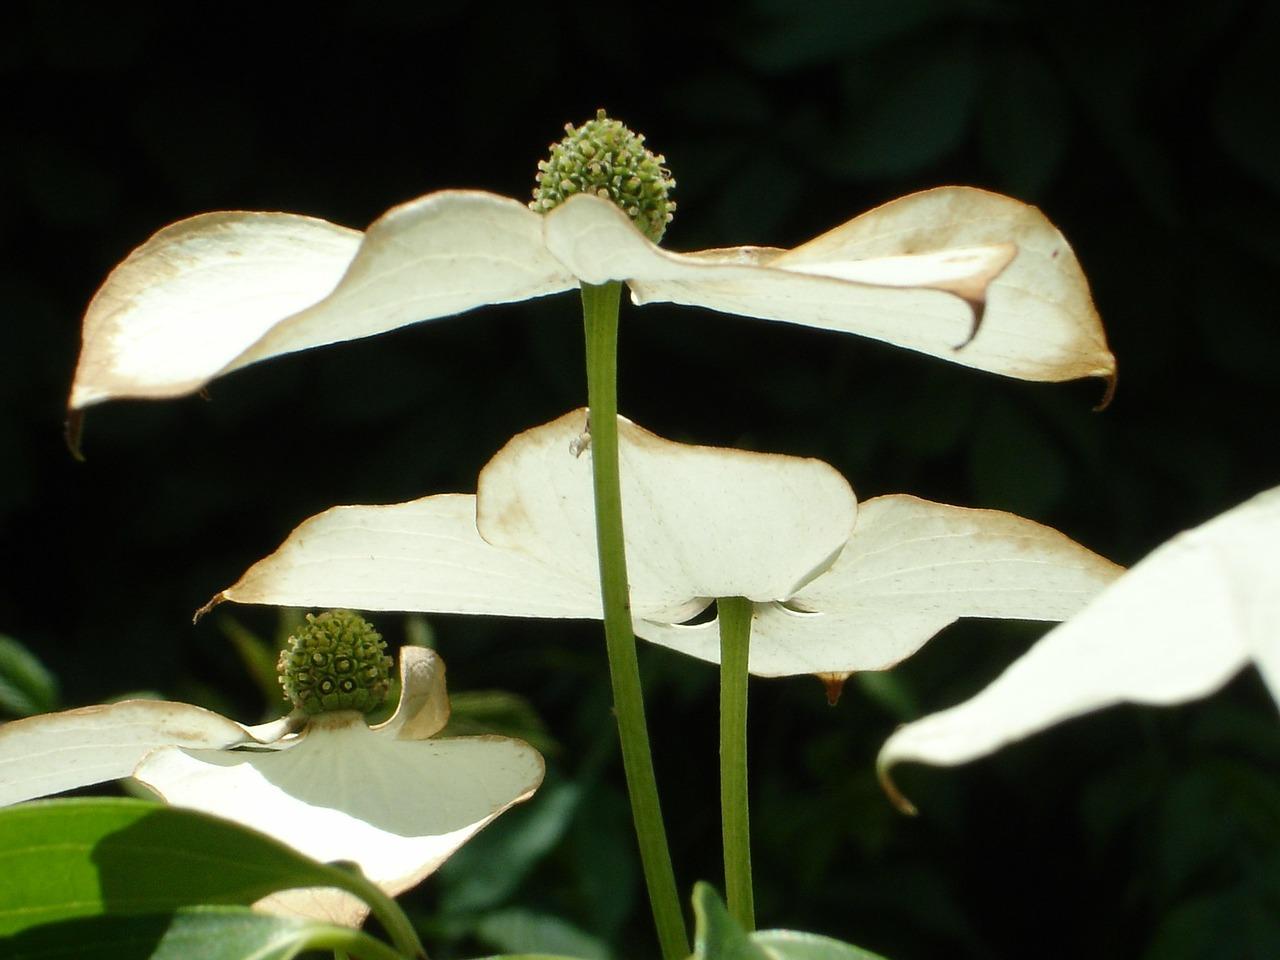 Cornus kousa - Japanse kornoelje  Hoogte: 200 - 700 cm  Kleur: Wit  Wintergroen: Nee  Bloeiperiode: April - Oktober